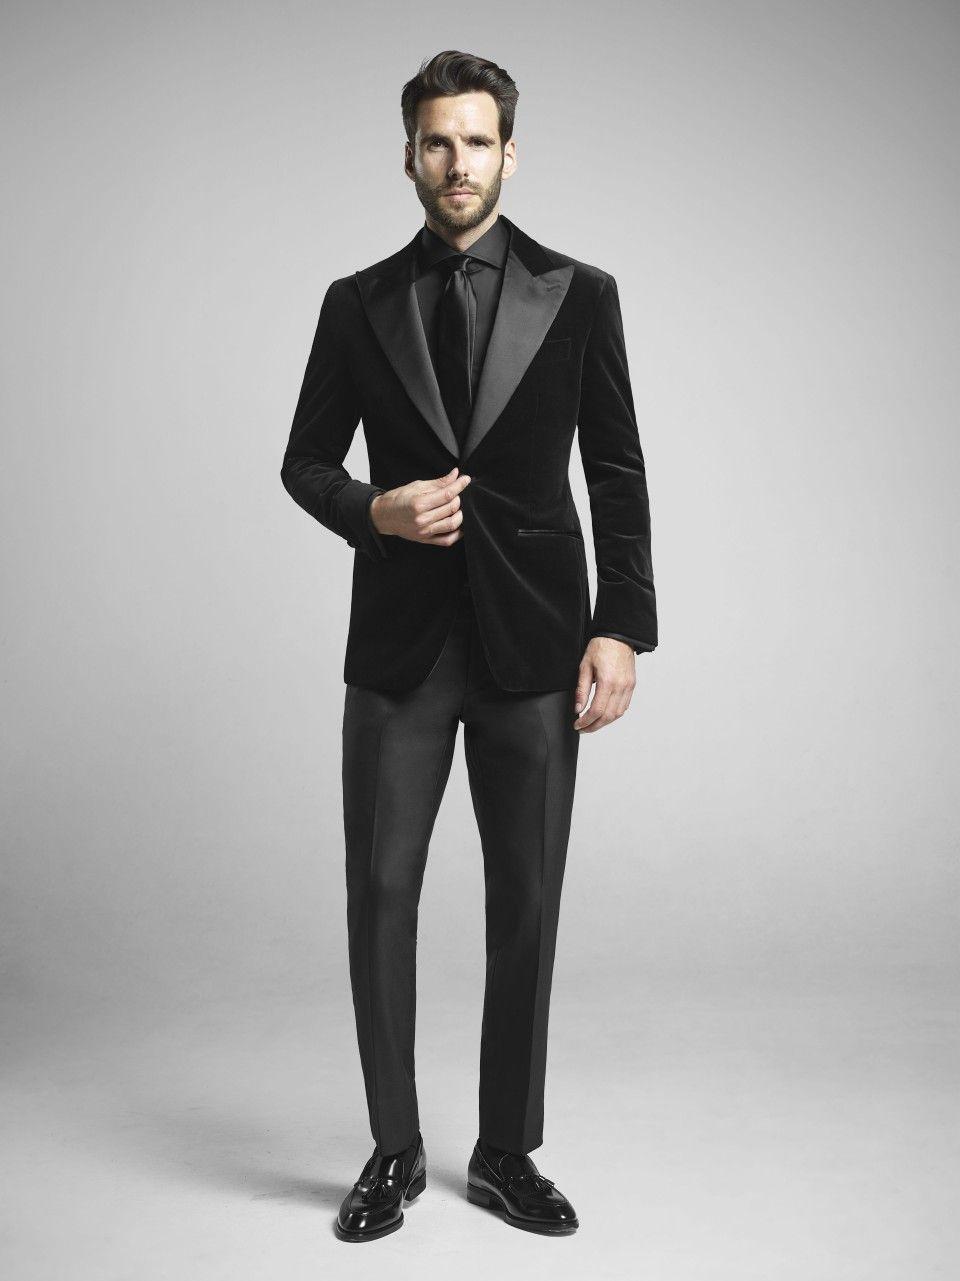 Pin By Sachin C Hubli On Suits Formal Men Outfit Black Velvet Suit Mens Outfits [ 1281 x 960 Pixel ]